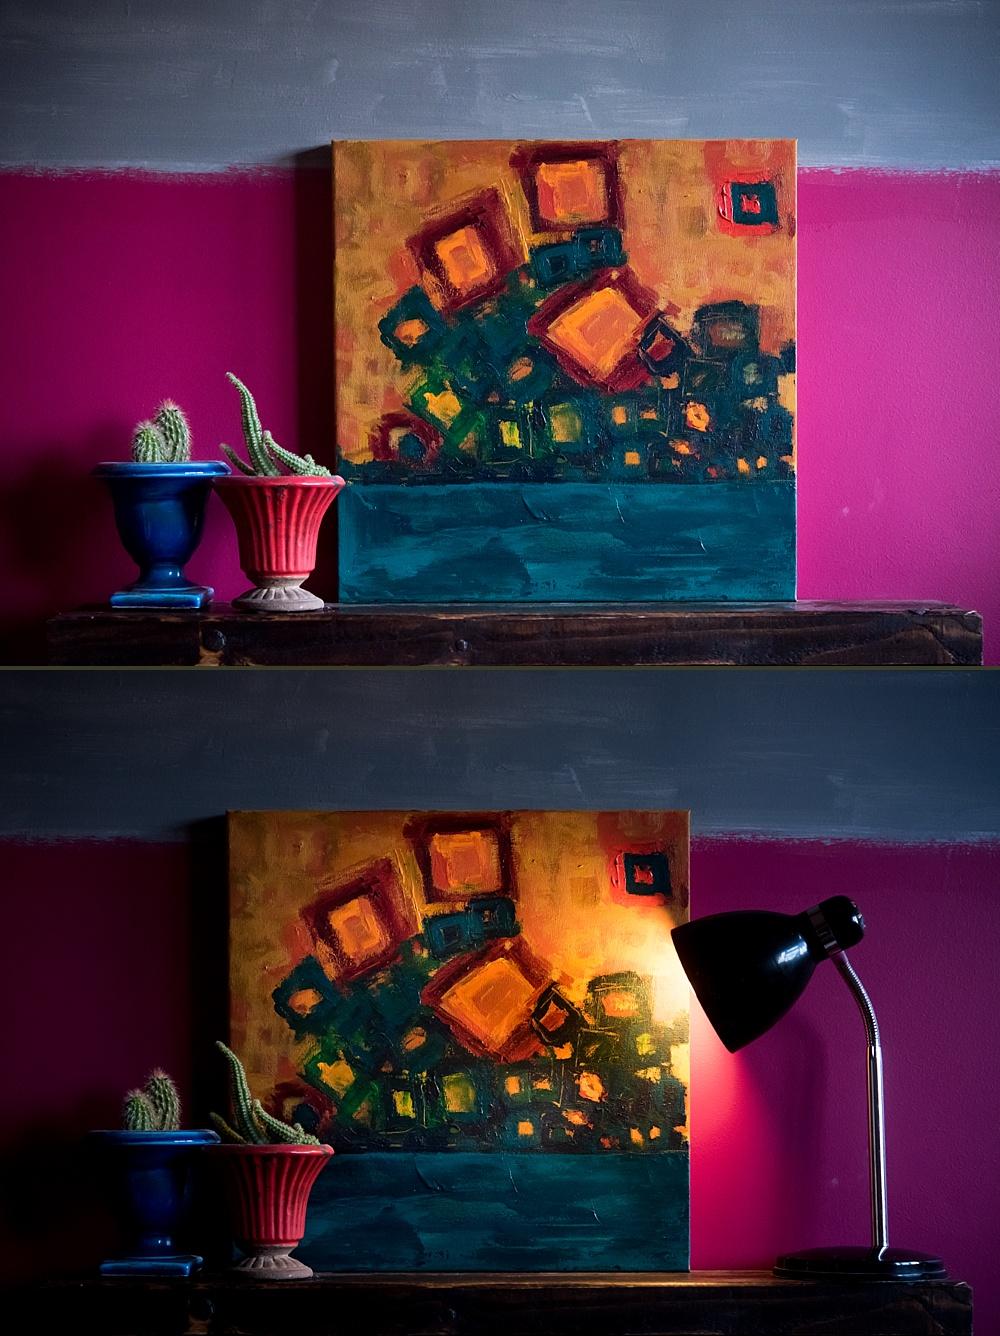 abstract-art-canvas-acrylic-lily-sawyer-fine-art-photographer-london-lily-sawyer-photo